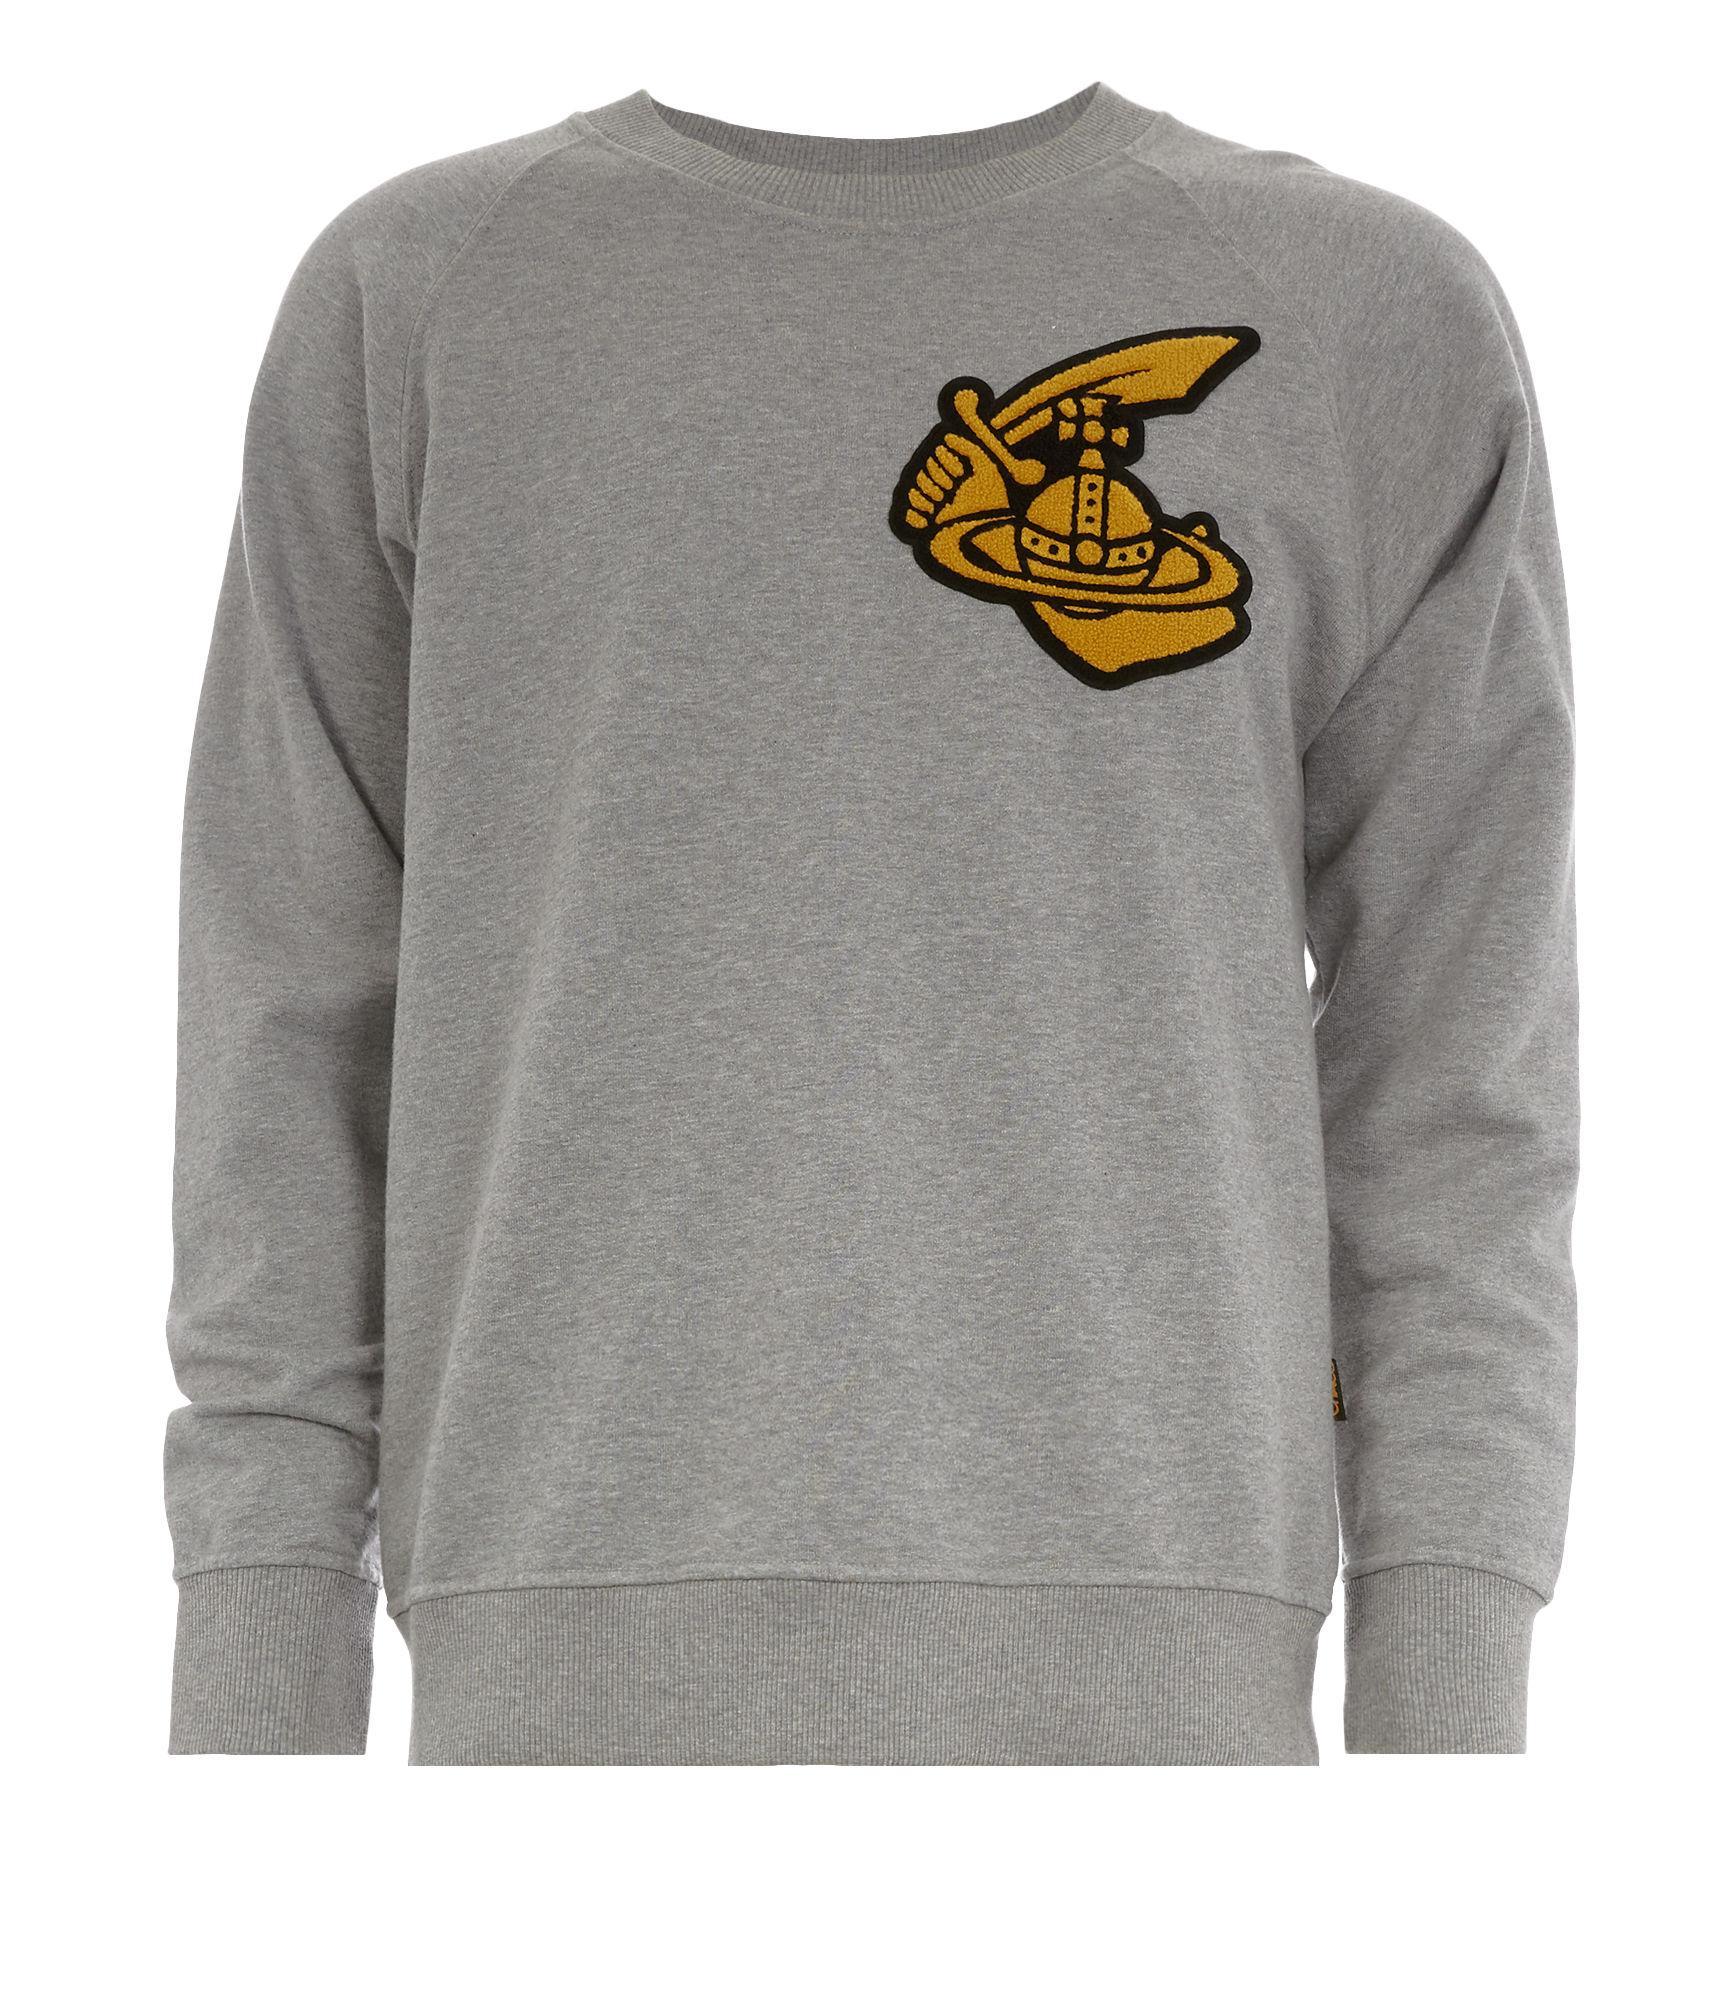 Vivienne Westwood Classic Sweatshirt With Patch Grey